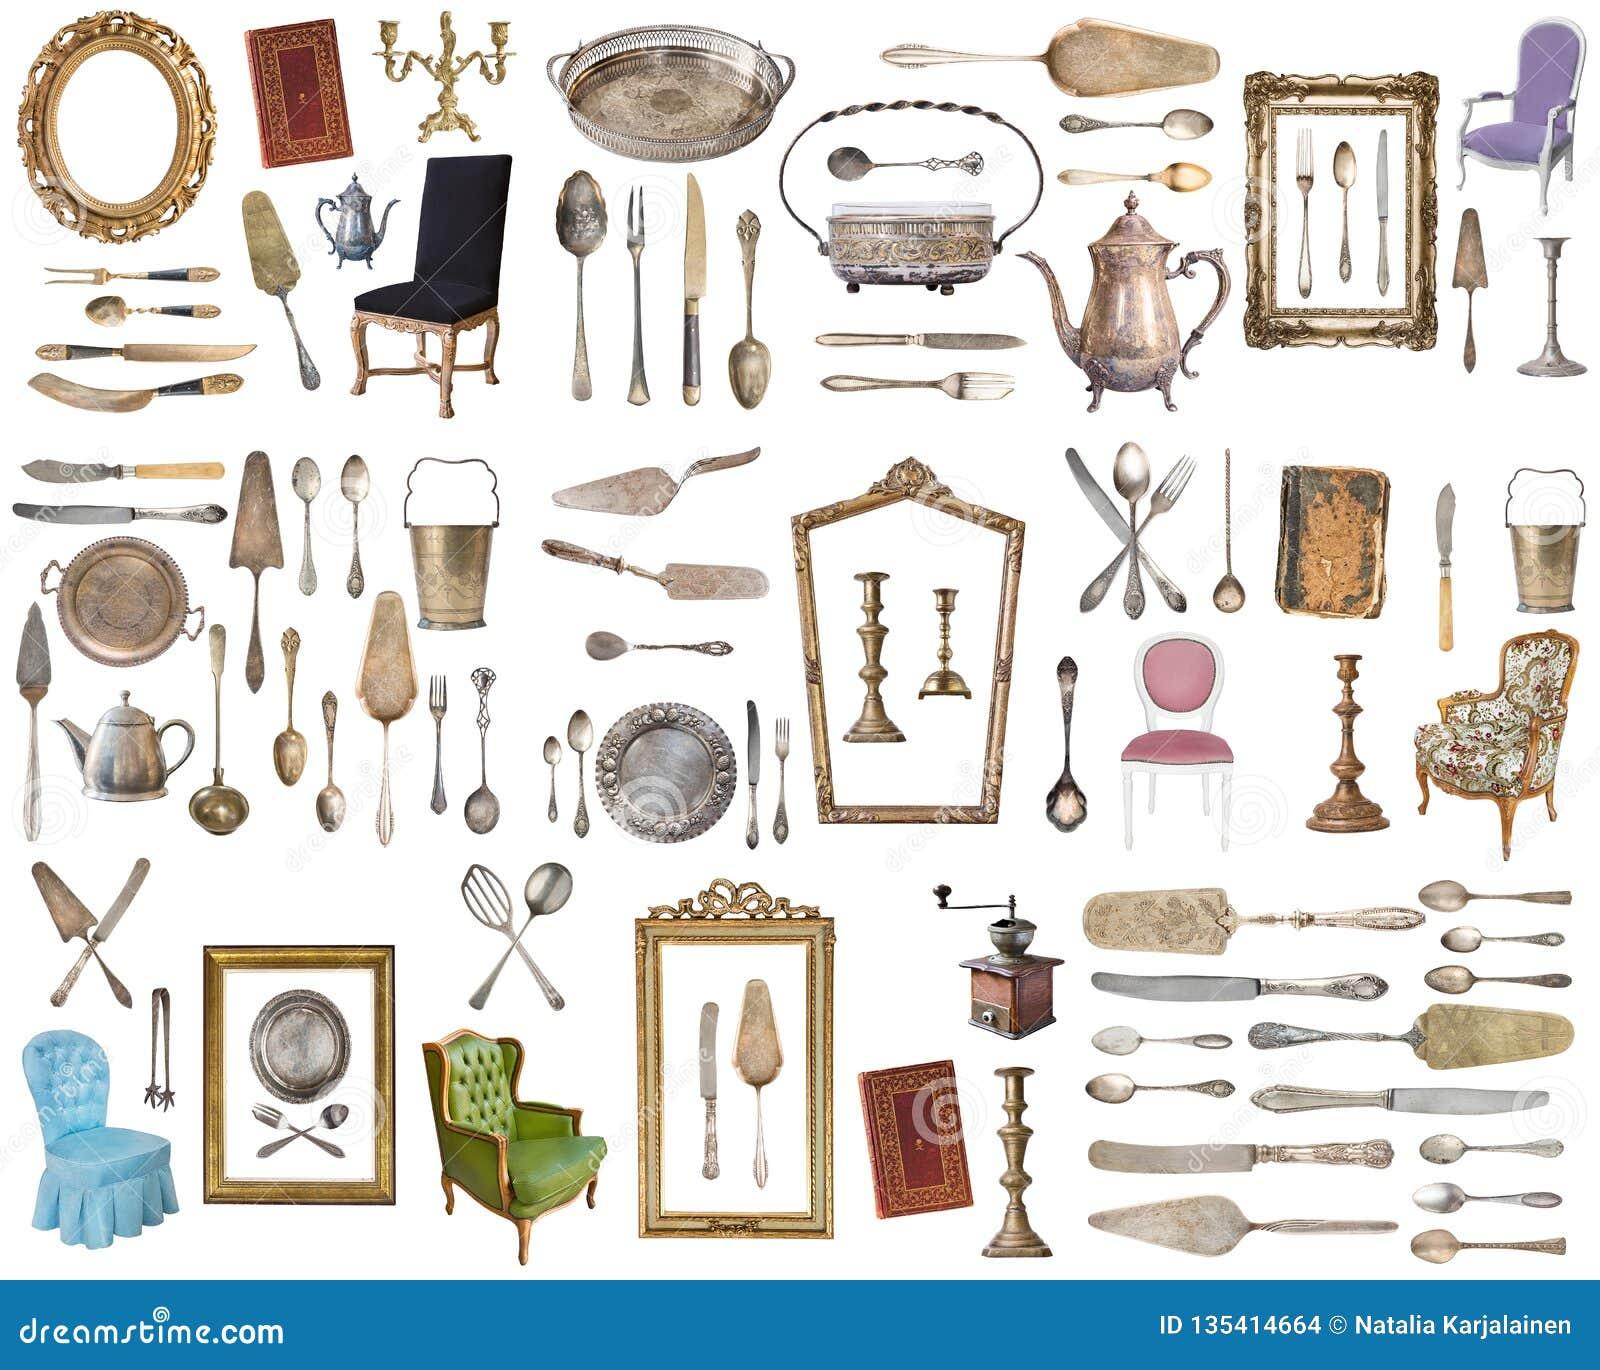 Huge Set Of Antique Items Vintage Household Items, Silverware